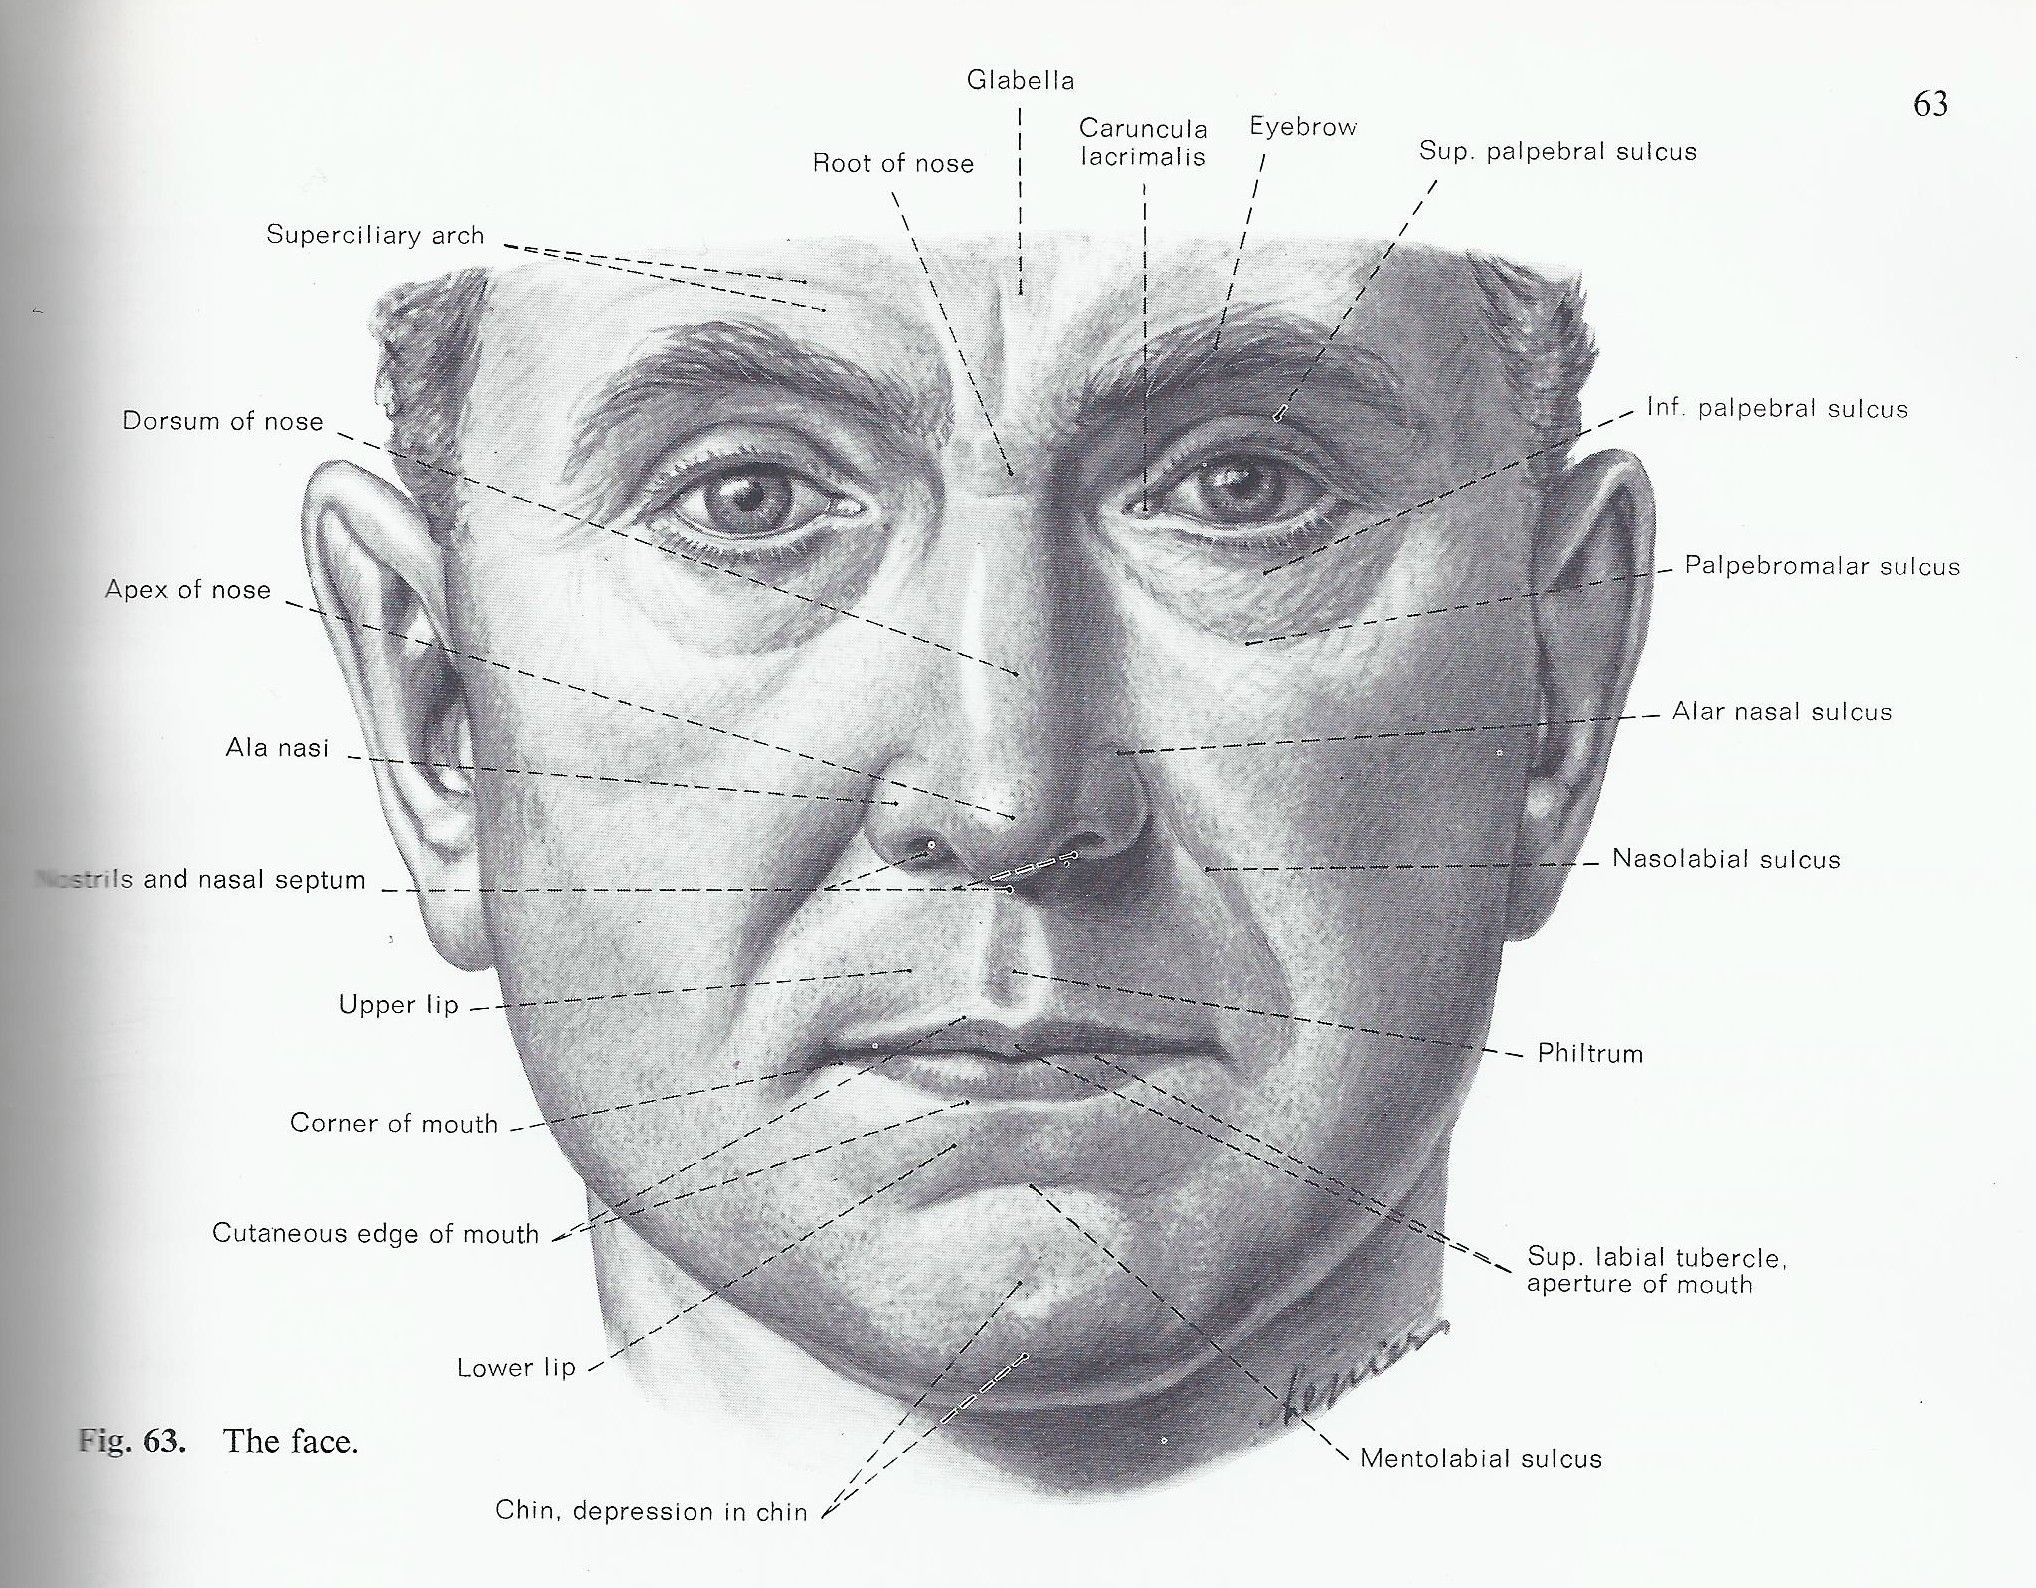 cheek bone anatomy cheek anatomy diagram human anatomy diagram [ 2036 x 1588 Pixel ]